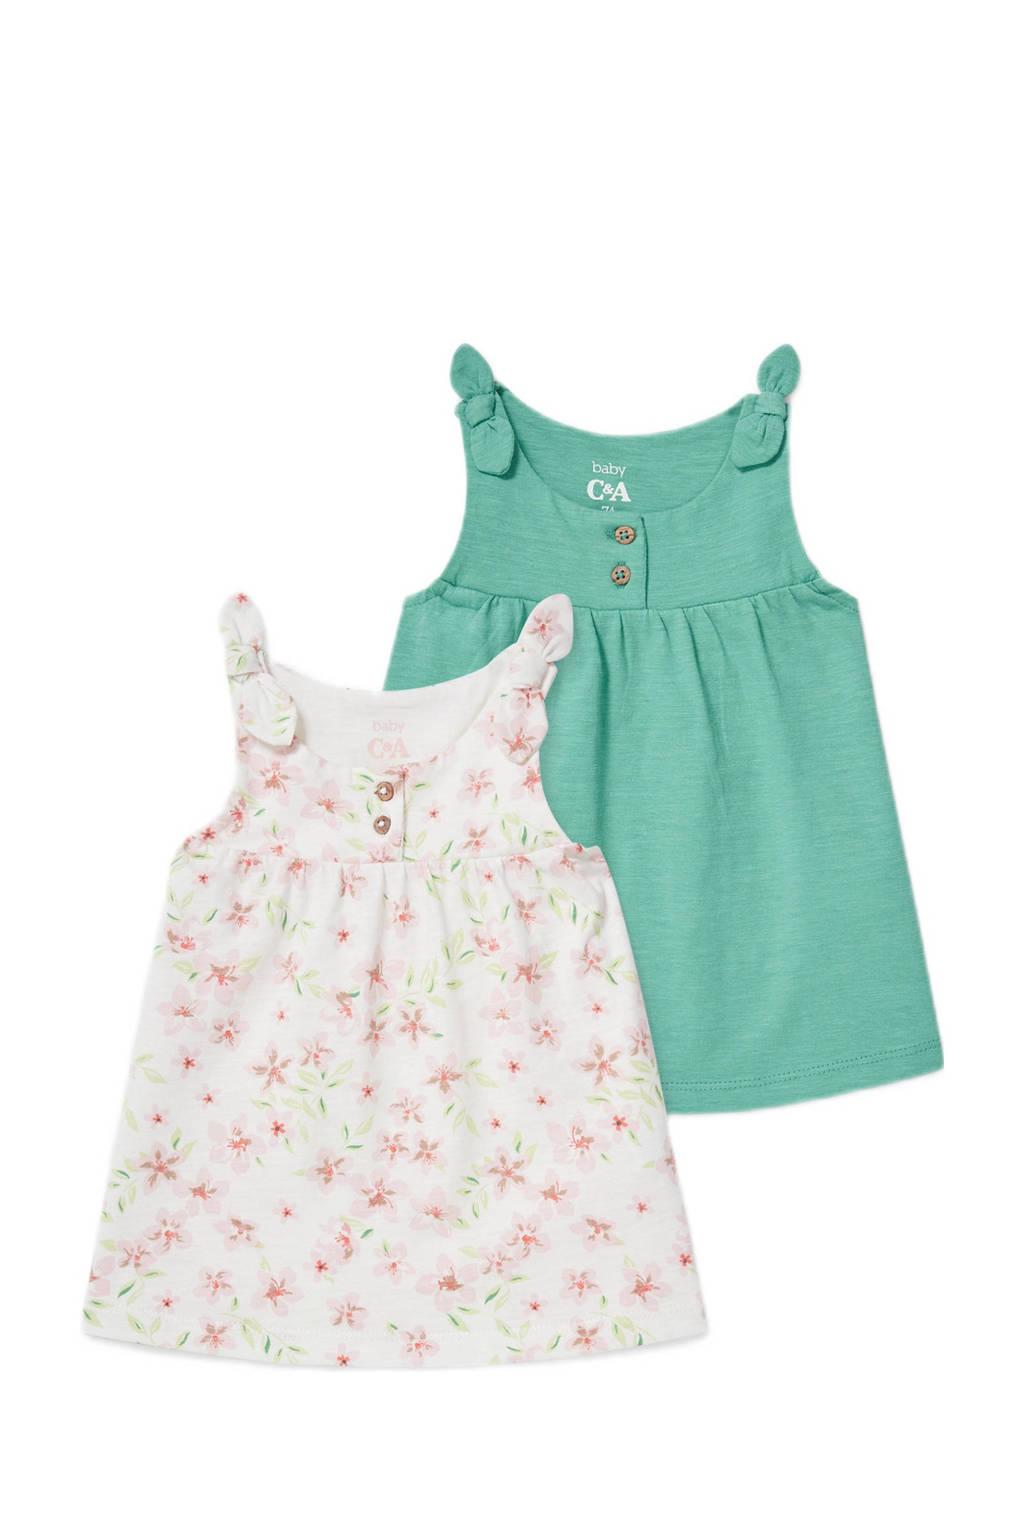 C&A Baby Club topje- set van 2 ecru/groen, Groen/ecru/roze